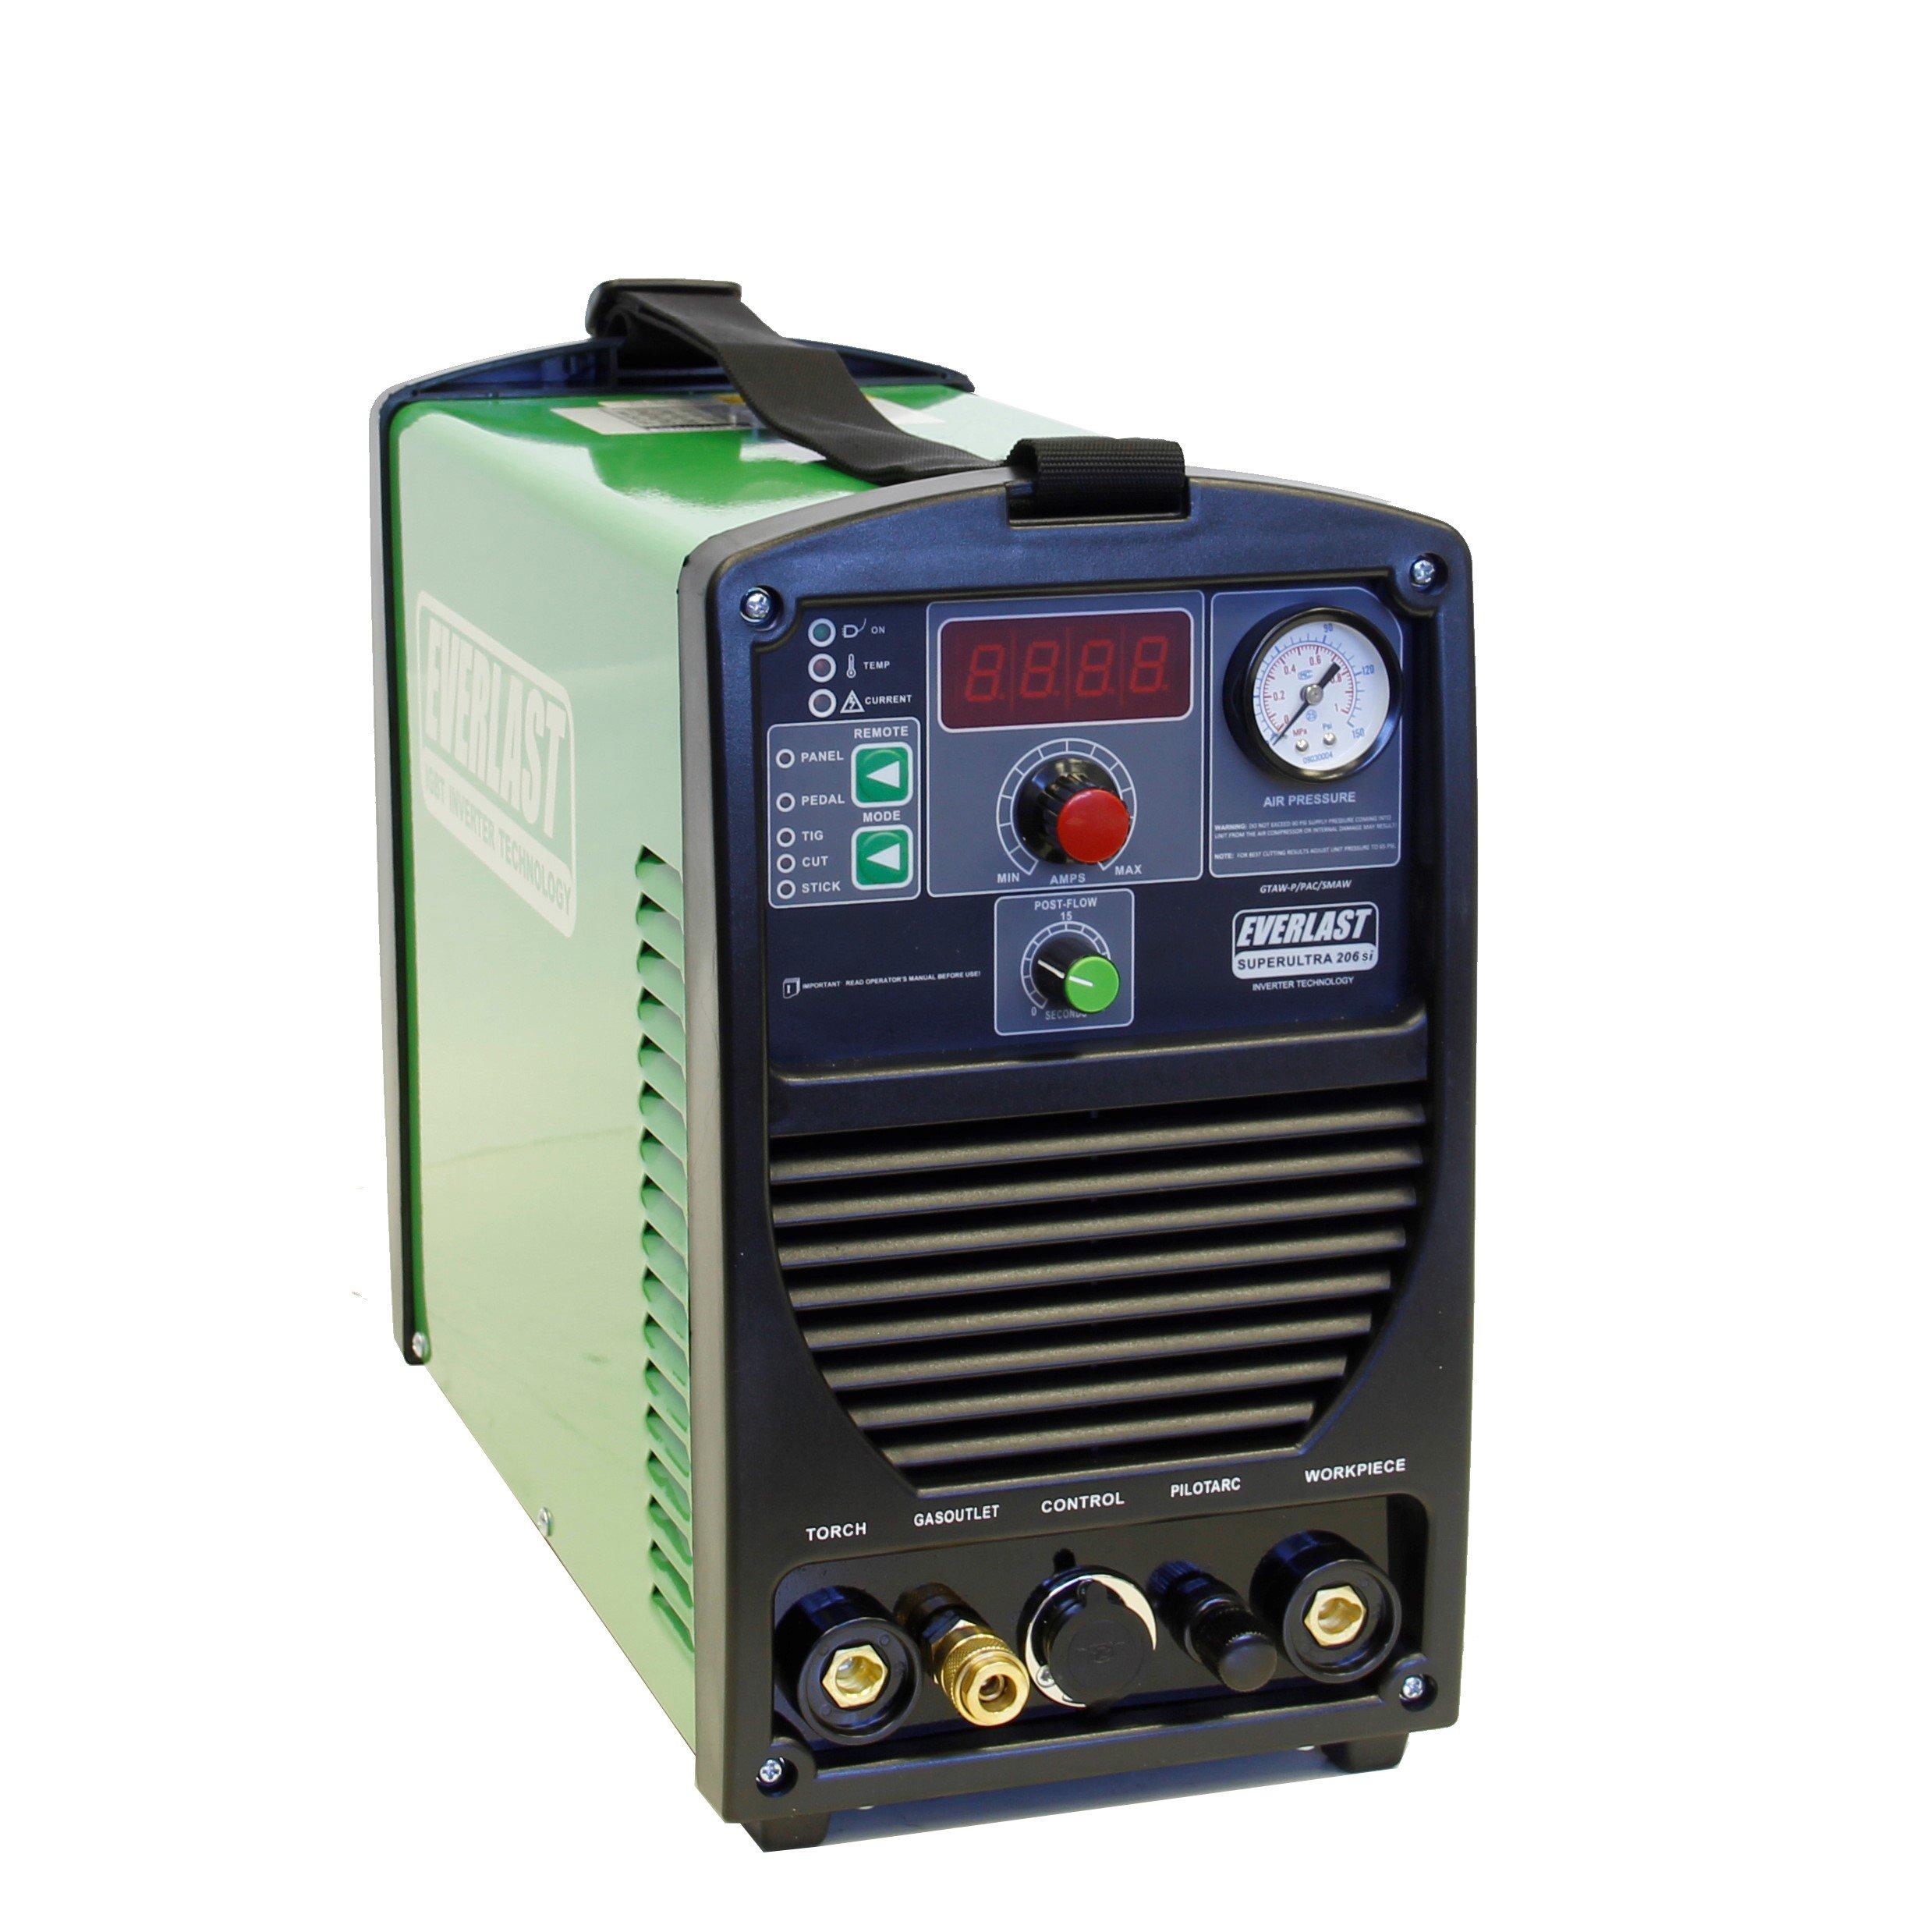 2017 Everlast SuperUltra 206si 200a Tig Stick 50a Plasma Cutter Multi Process Welder Dual Voltage 110/220v